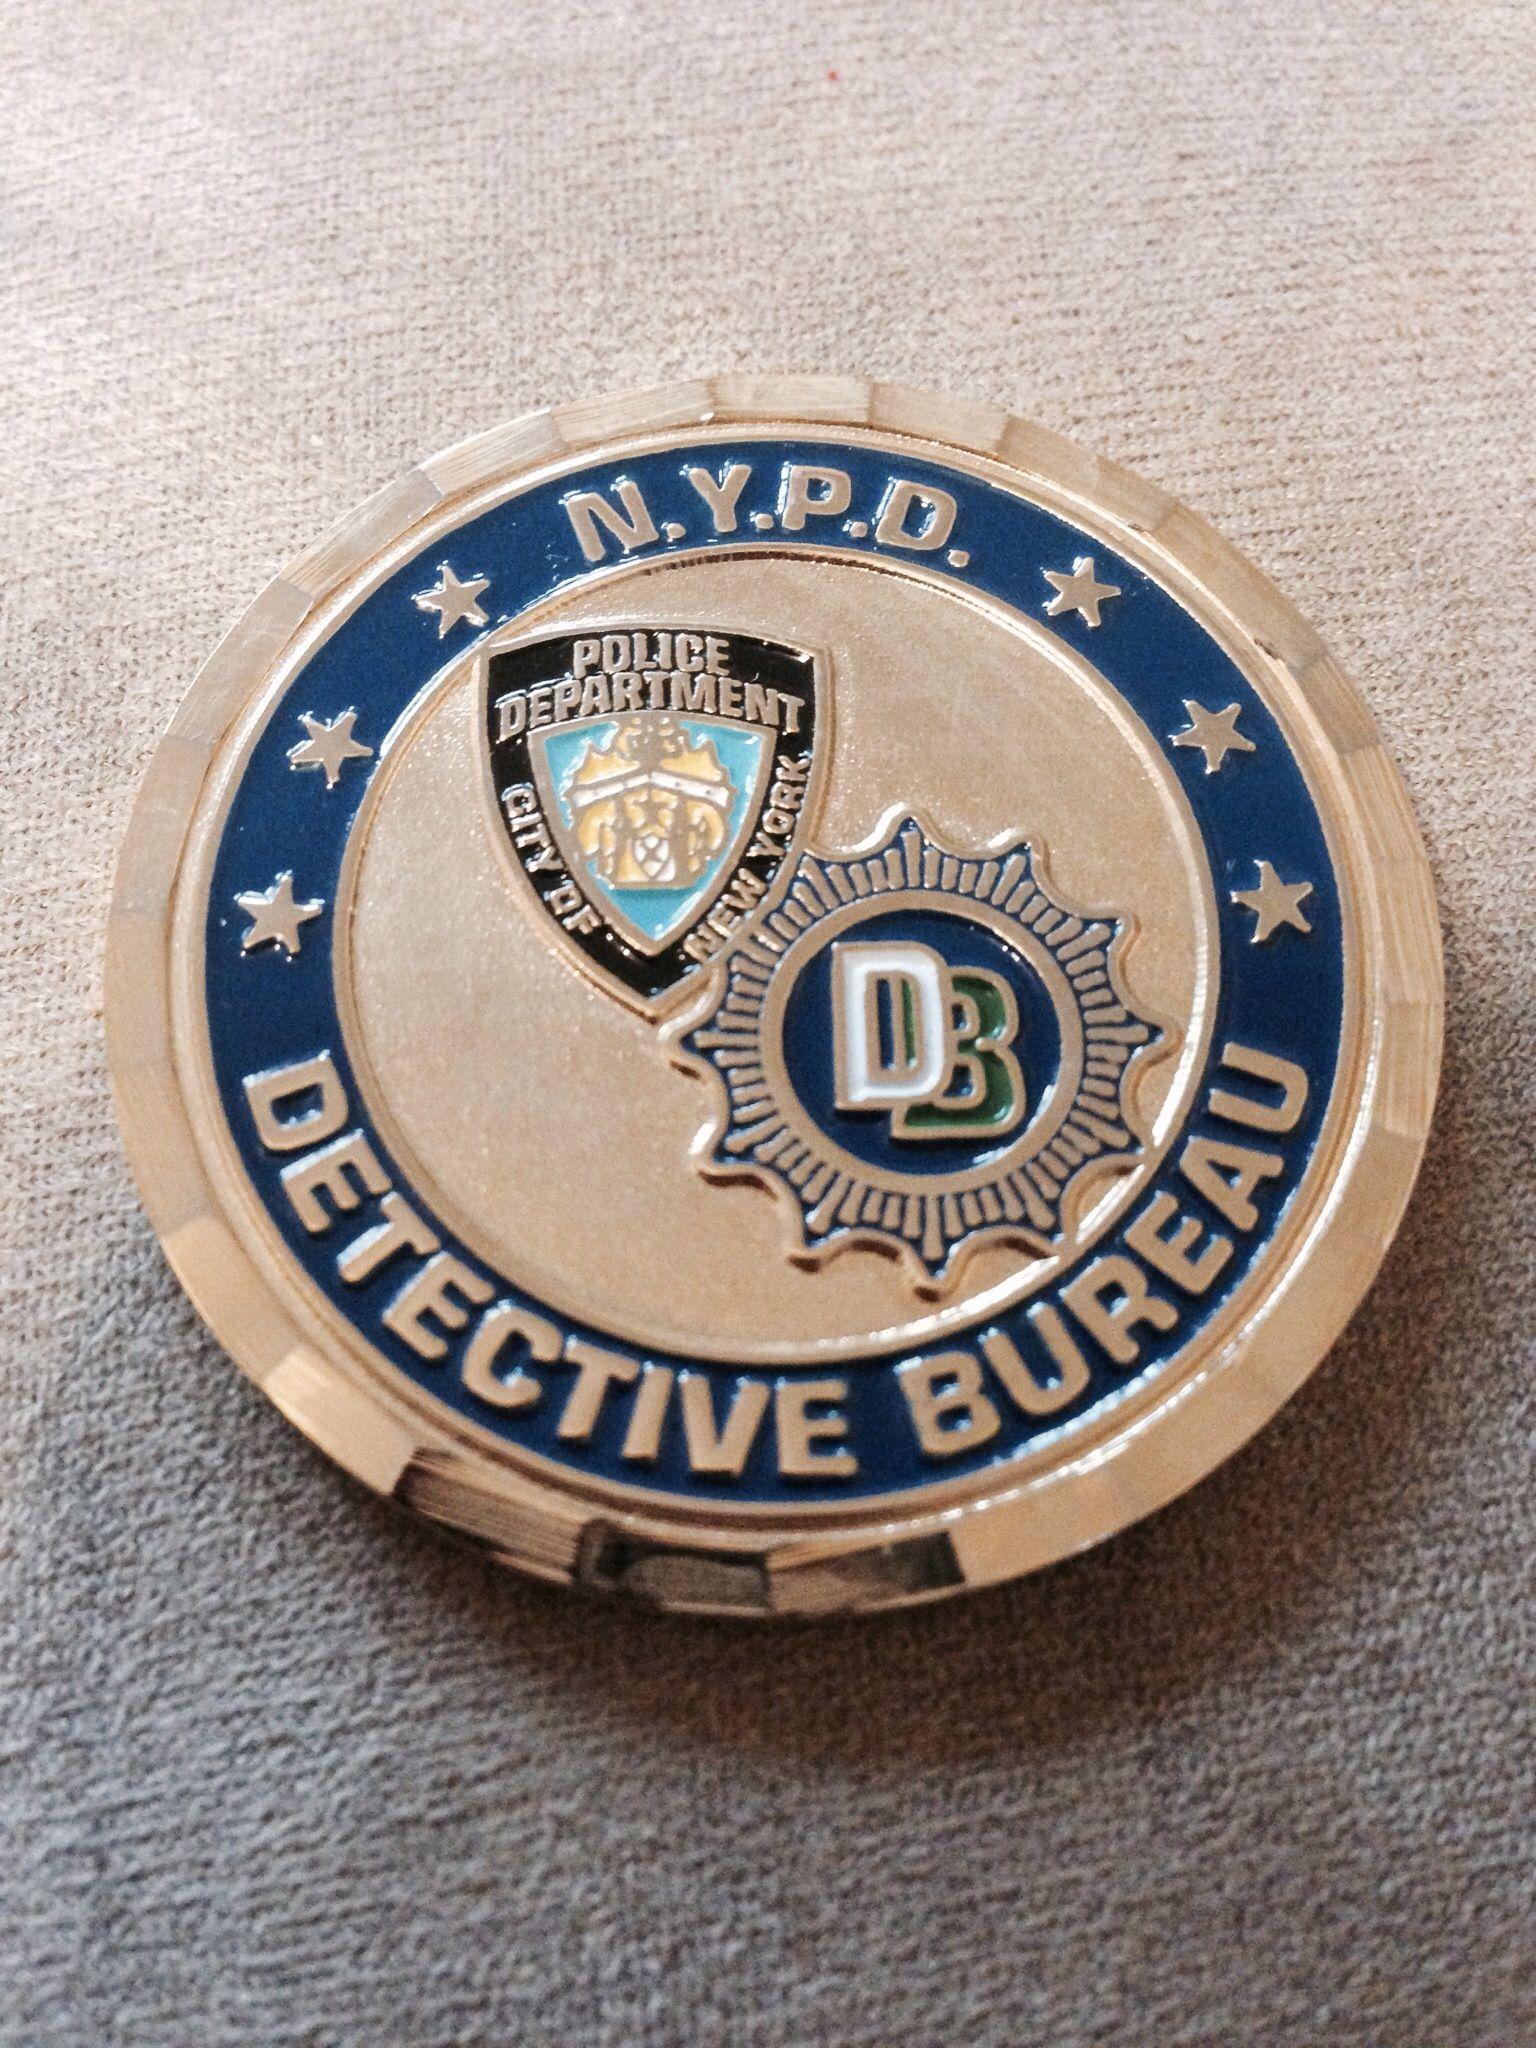 new york police department detective bureau hostage negotiator team nypd pinterest. Black Bedroom Furniture Sets. Home Design Ideas